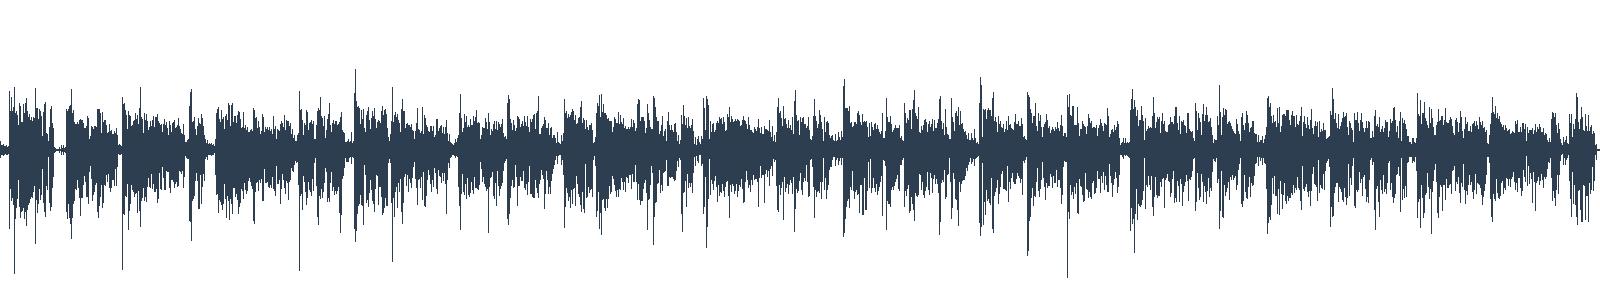 Nové audioknihy 35/2019 waveform